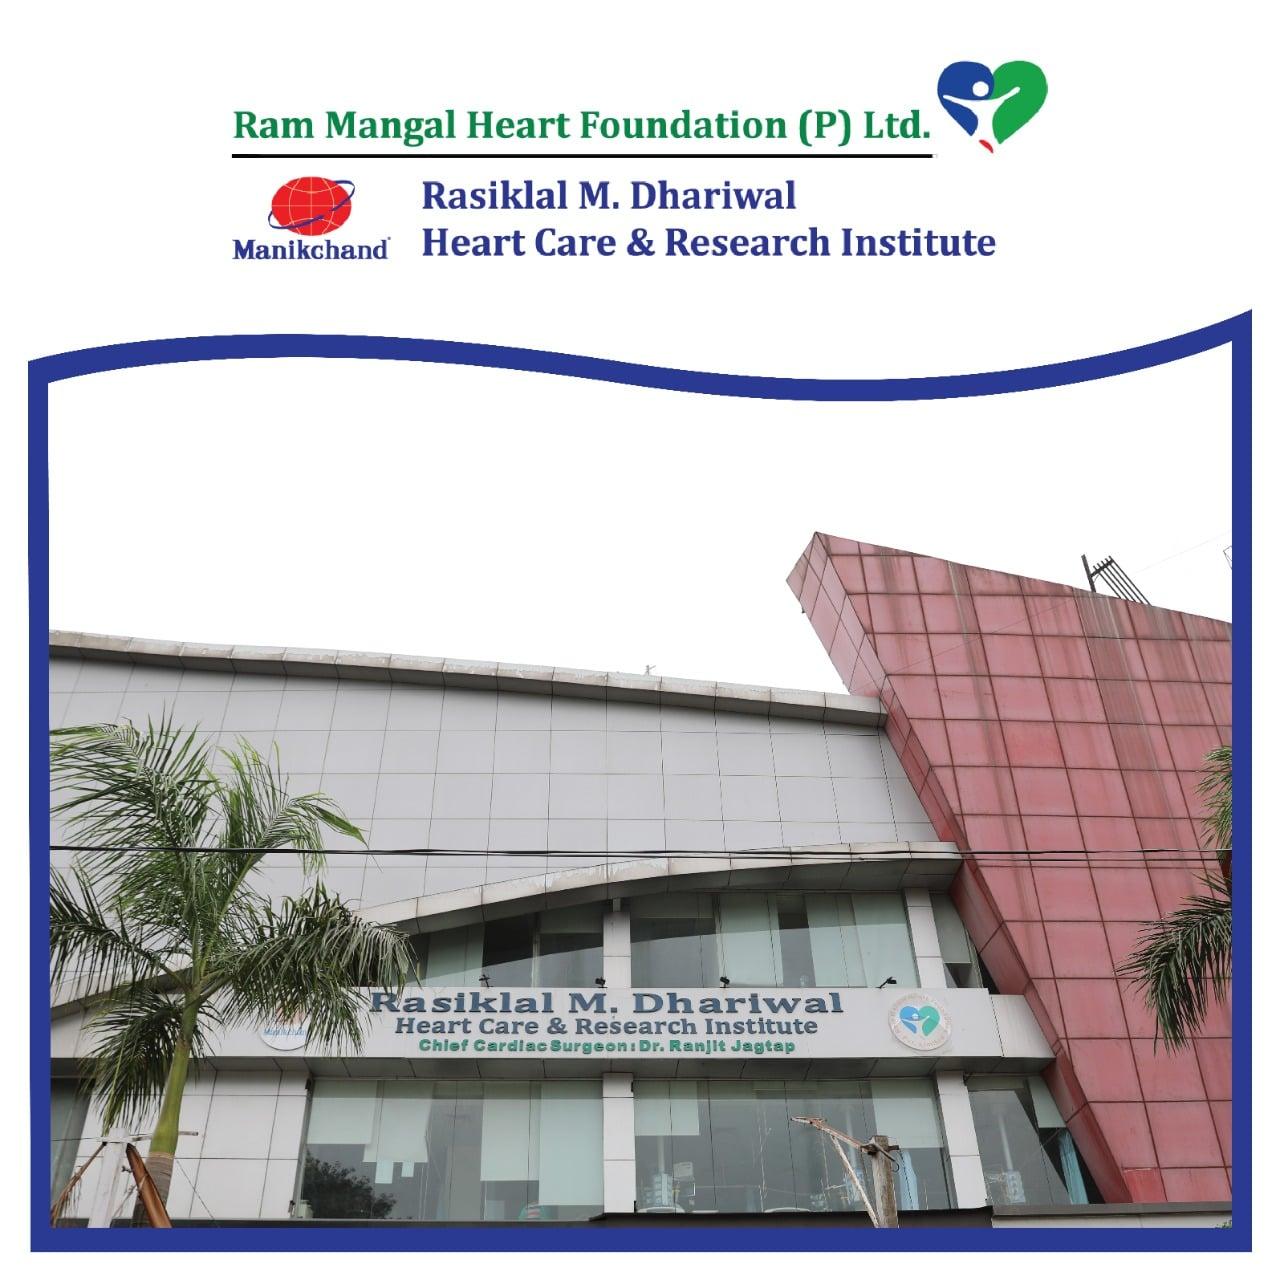 Rammangal Heart Foundation